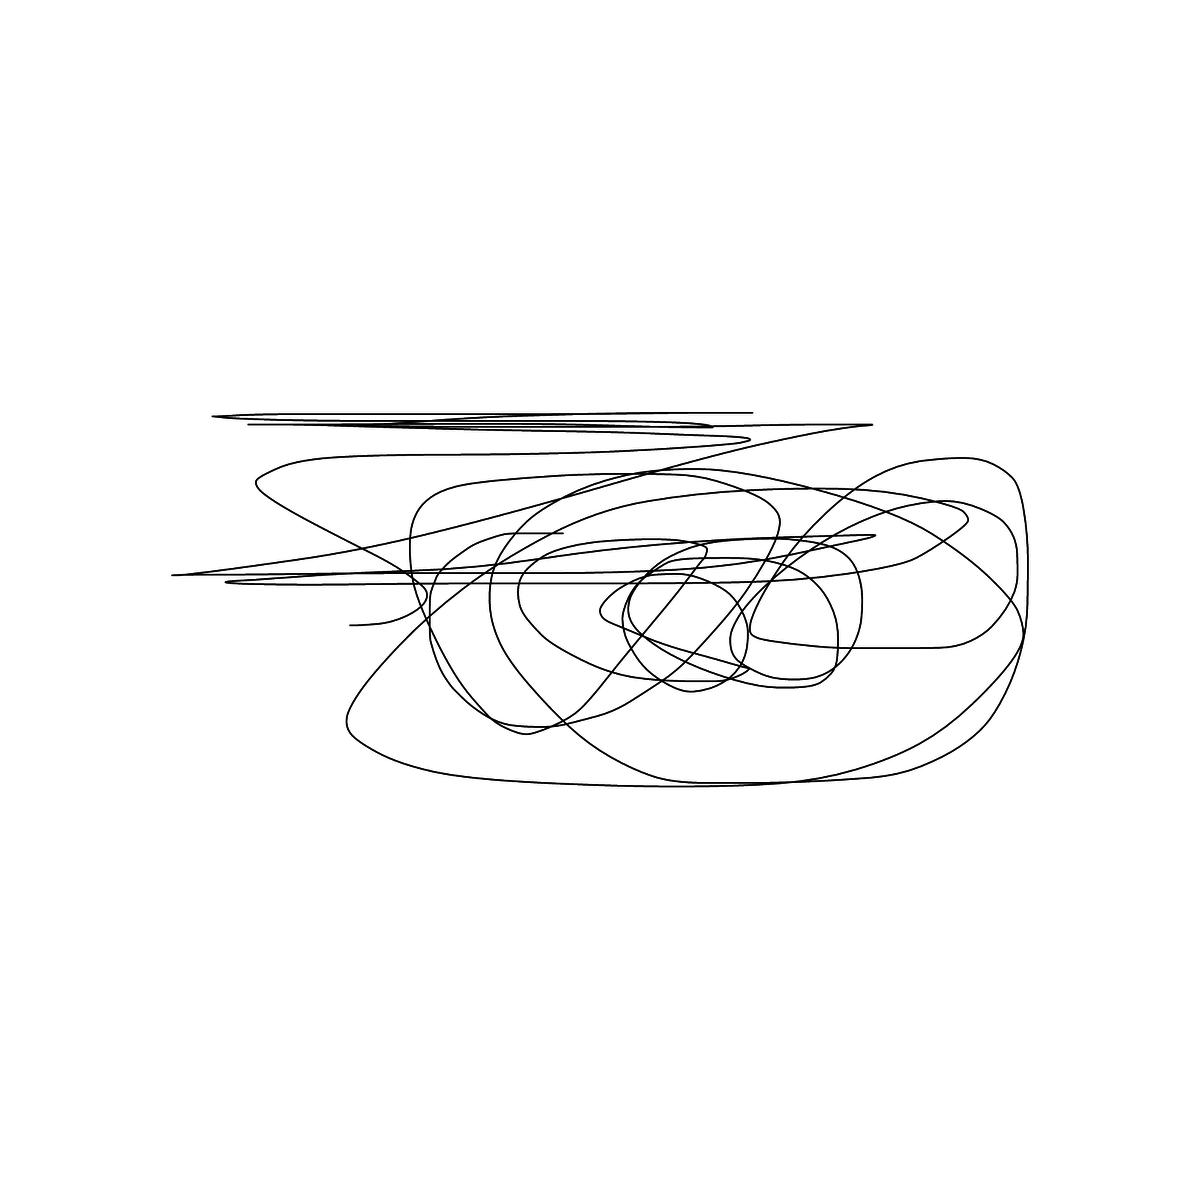 BAAAM drawing#248 lat:44.3395652770996100lng: 2.4609375000000000